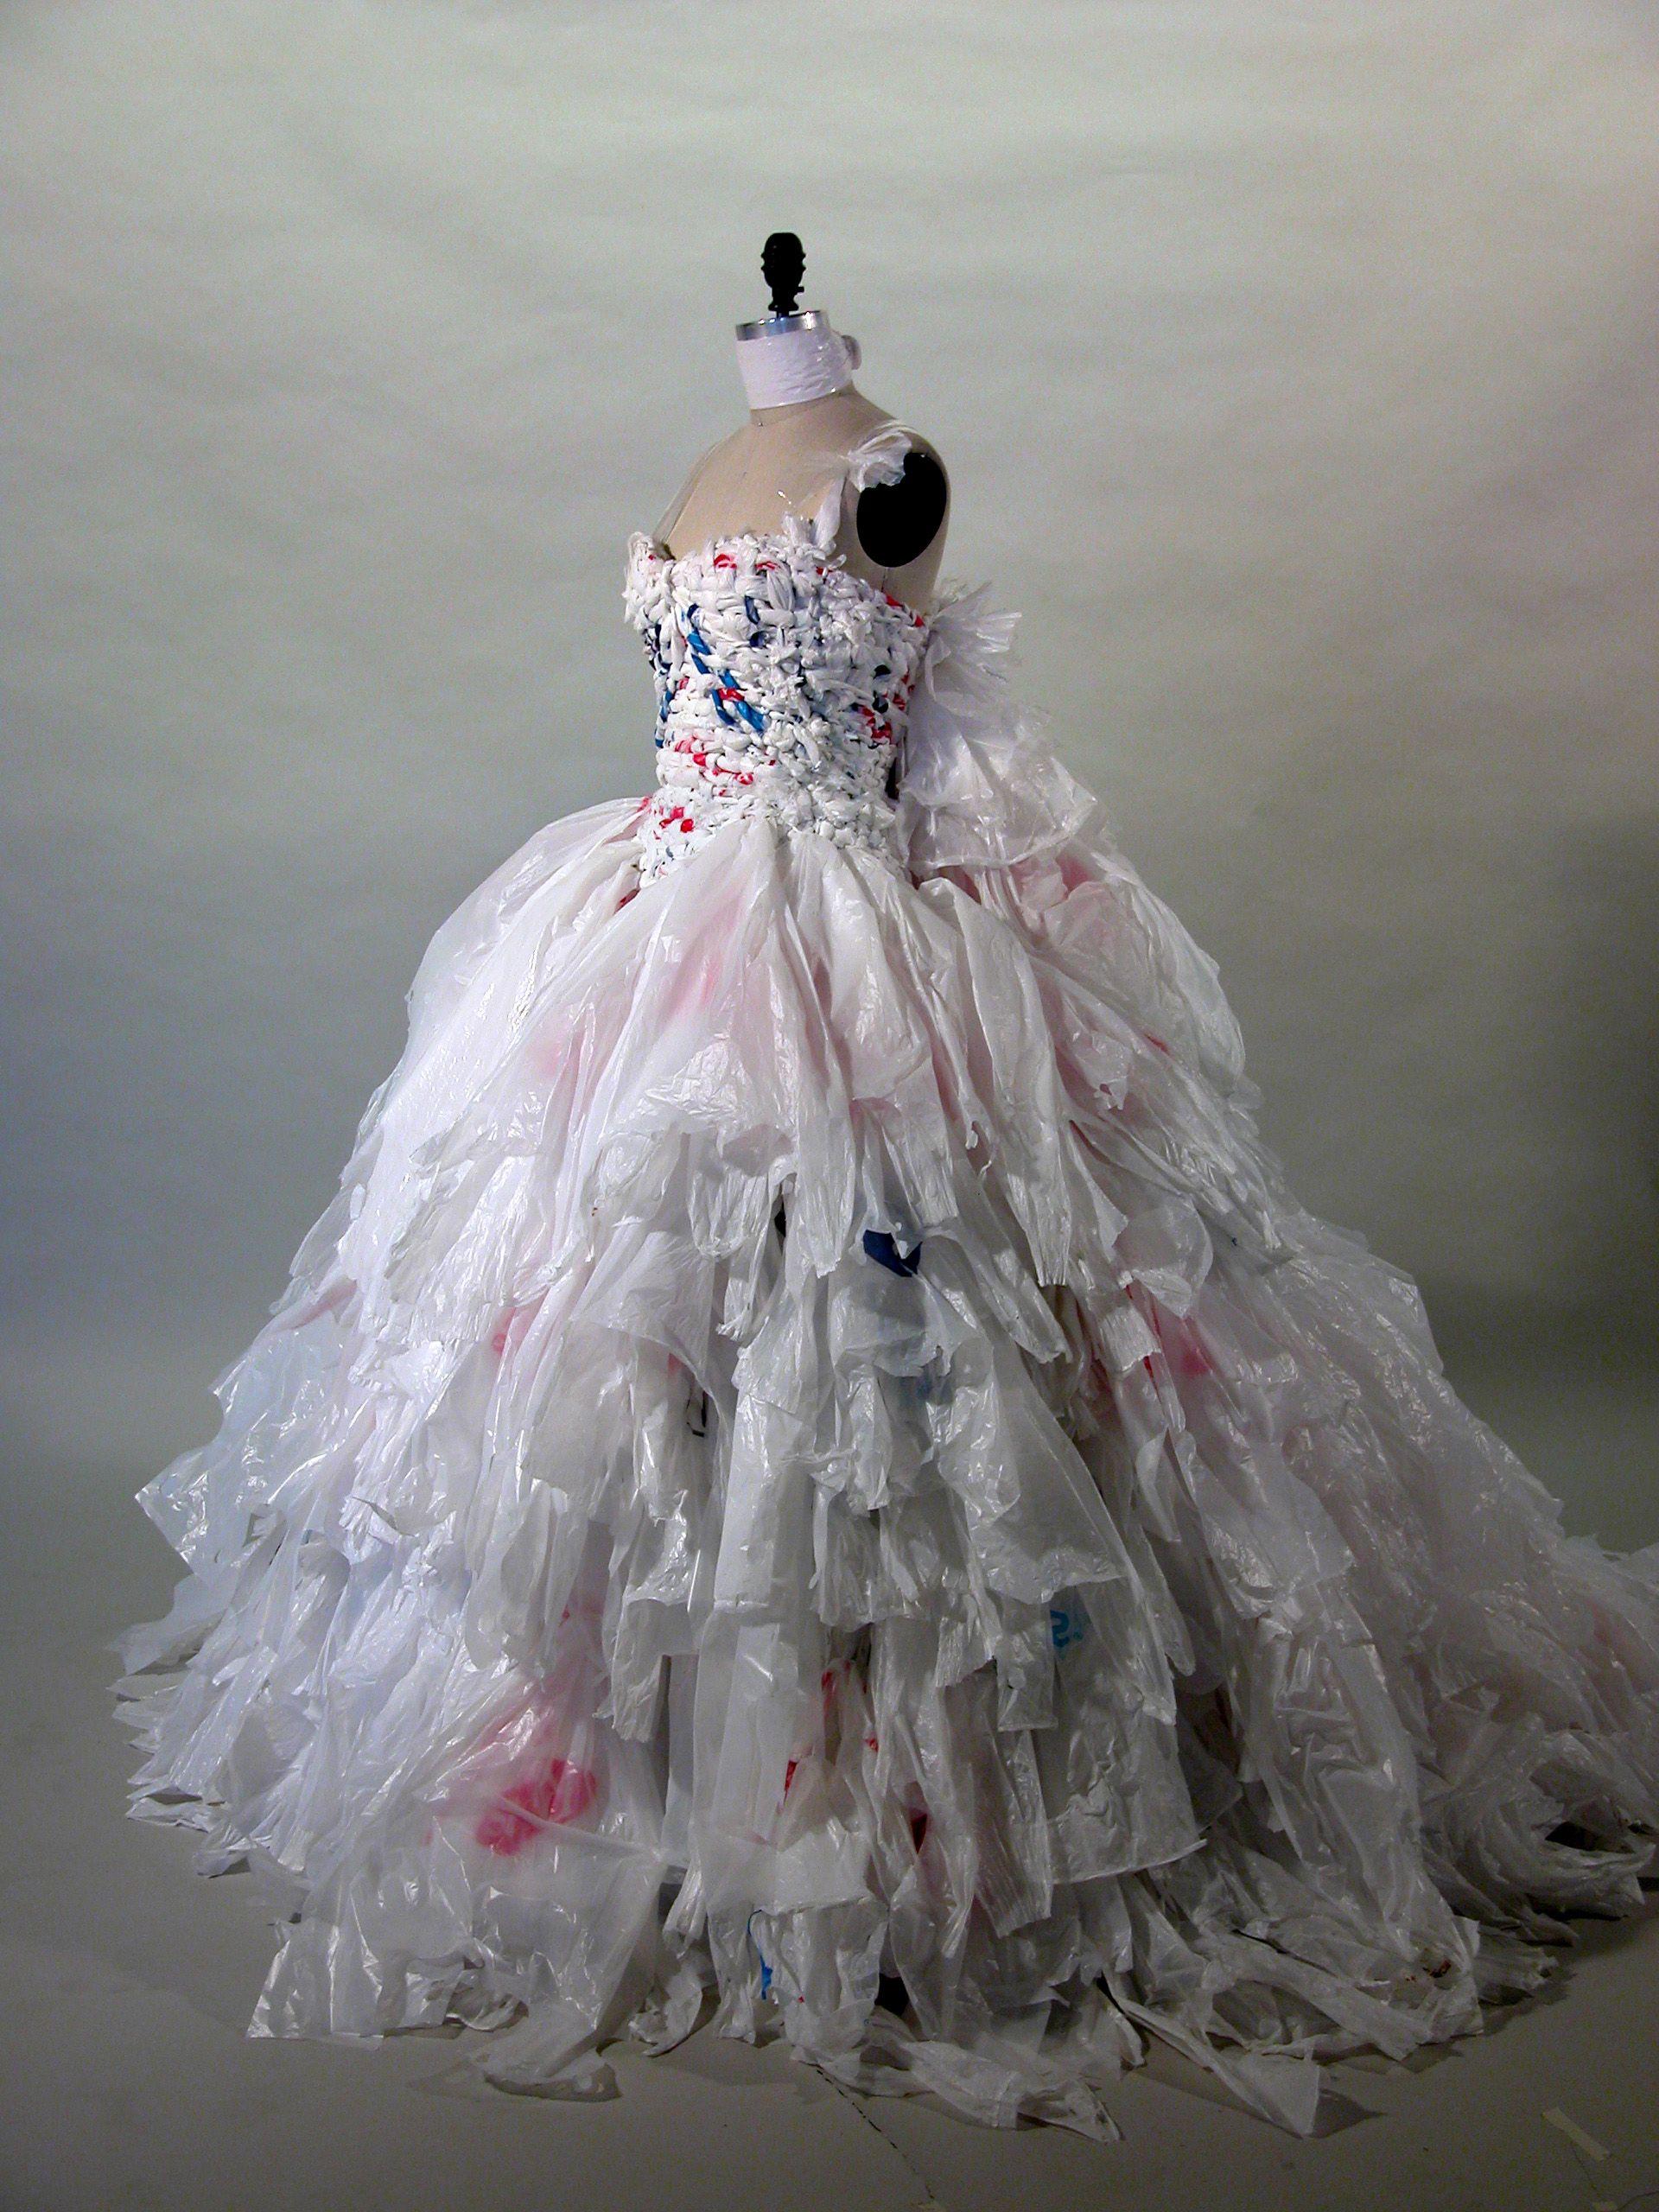 plastic bag dress kleding van vuilniszakken pinterest